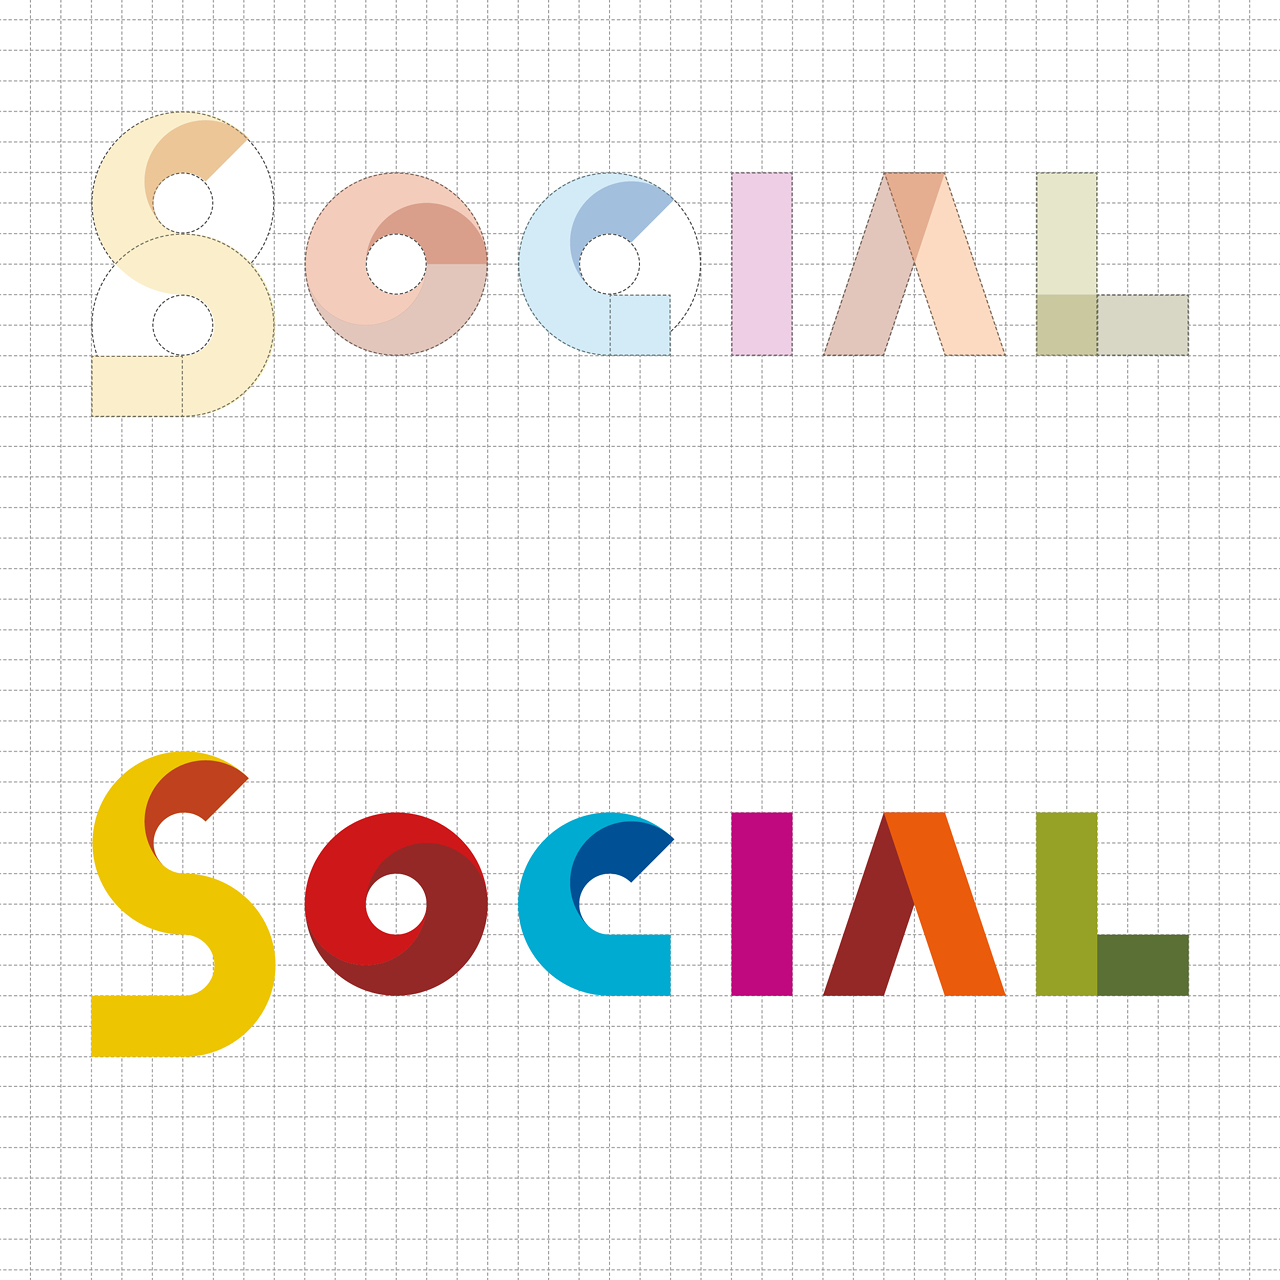 social pedagogy book cover illustration